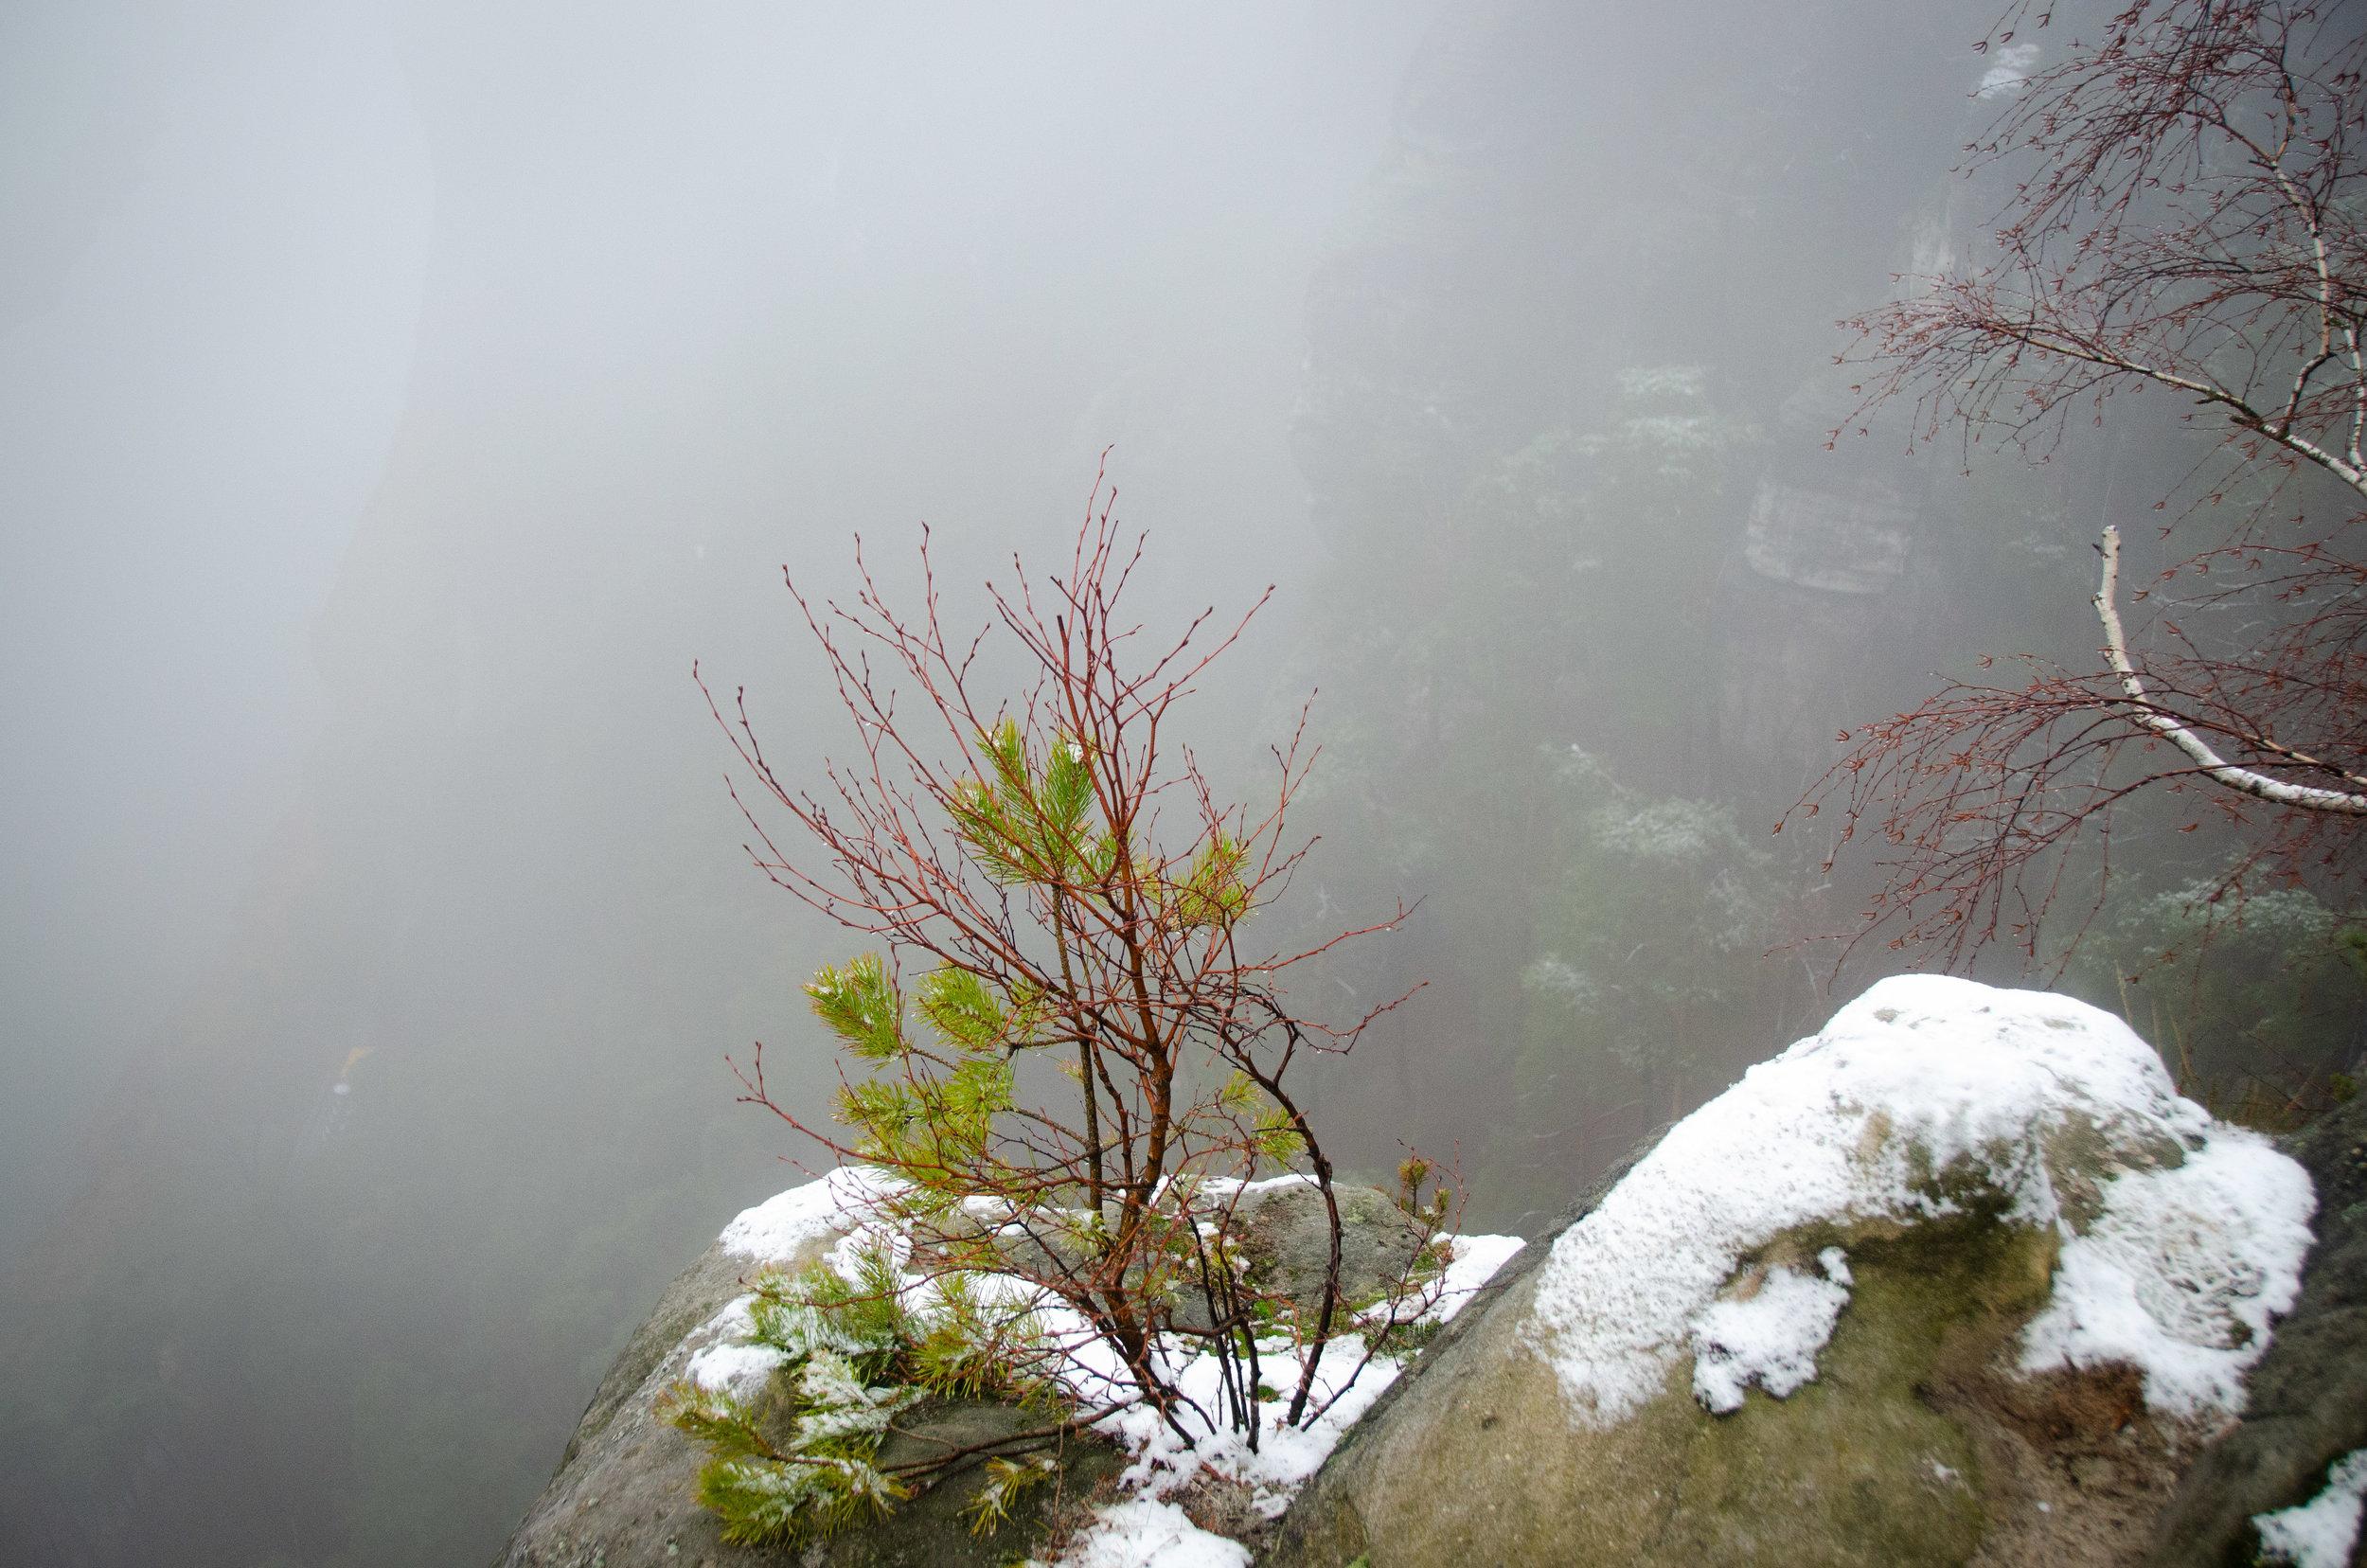 saxon switzerland. hiking